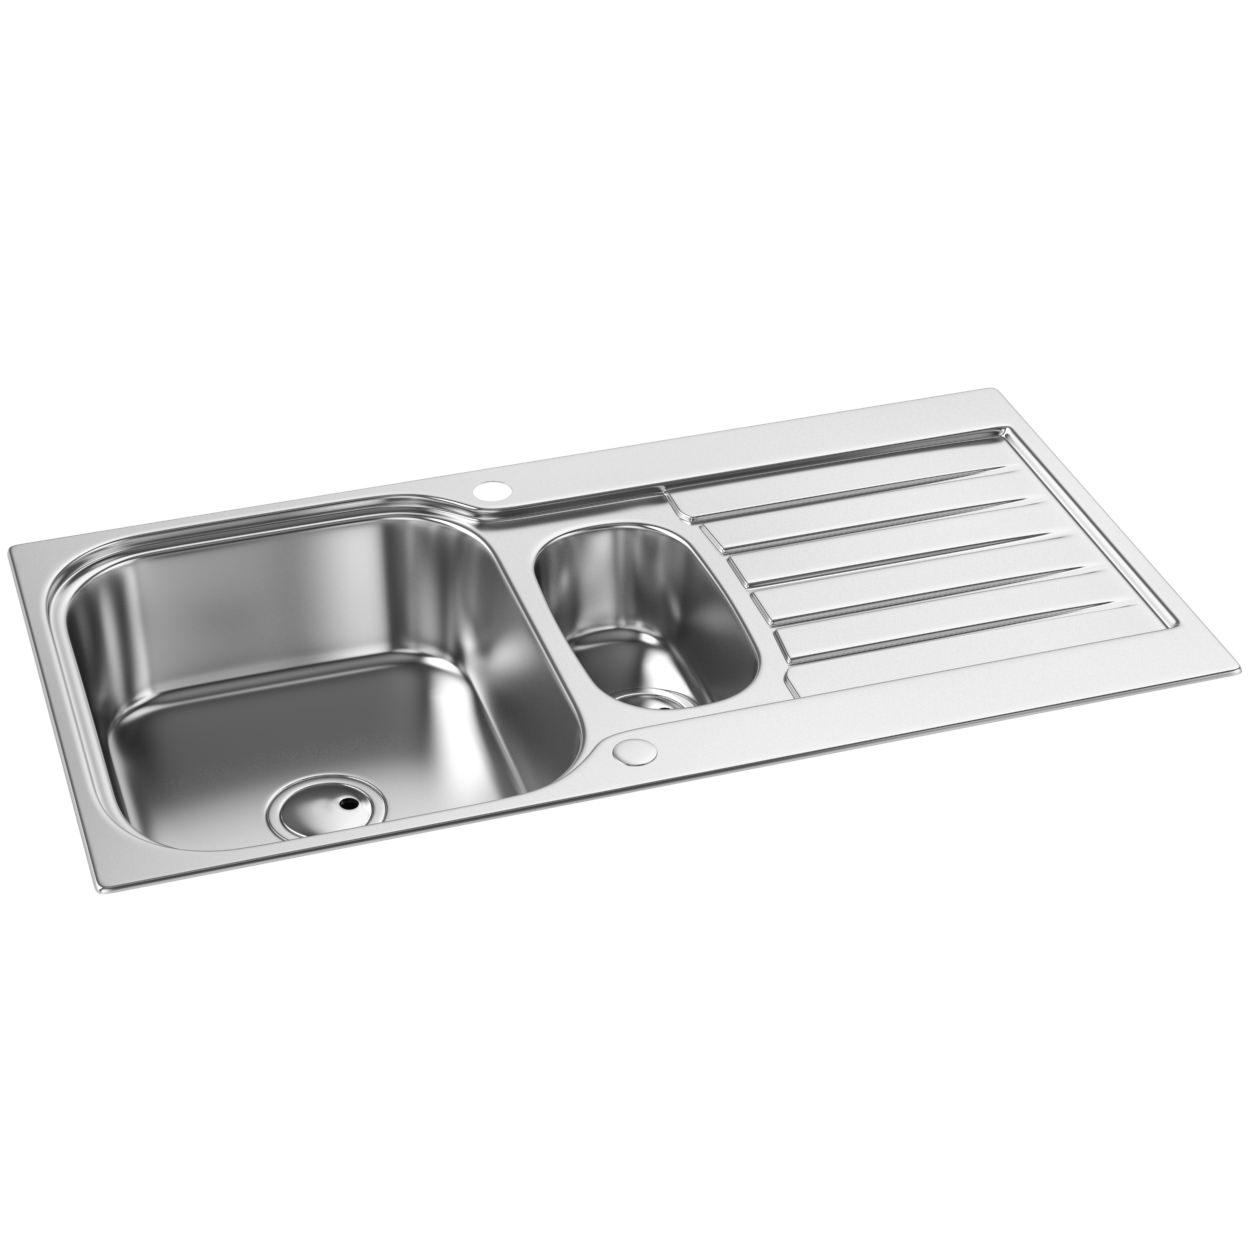 ... kitchens one and half bowl abode arka 1 5 bowl reversible kitchen sink